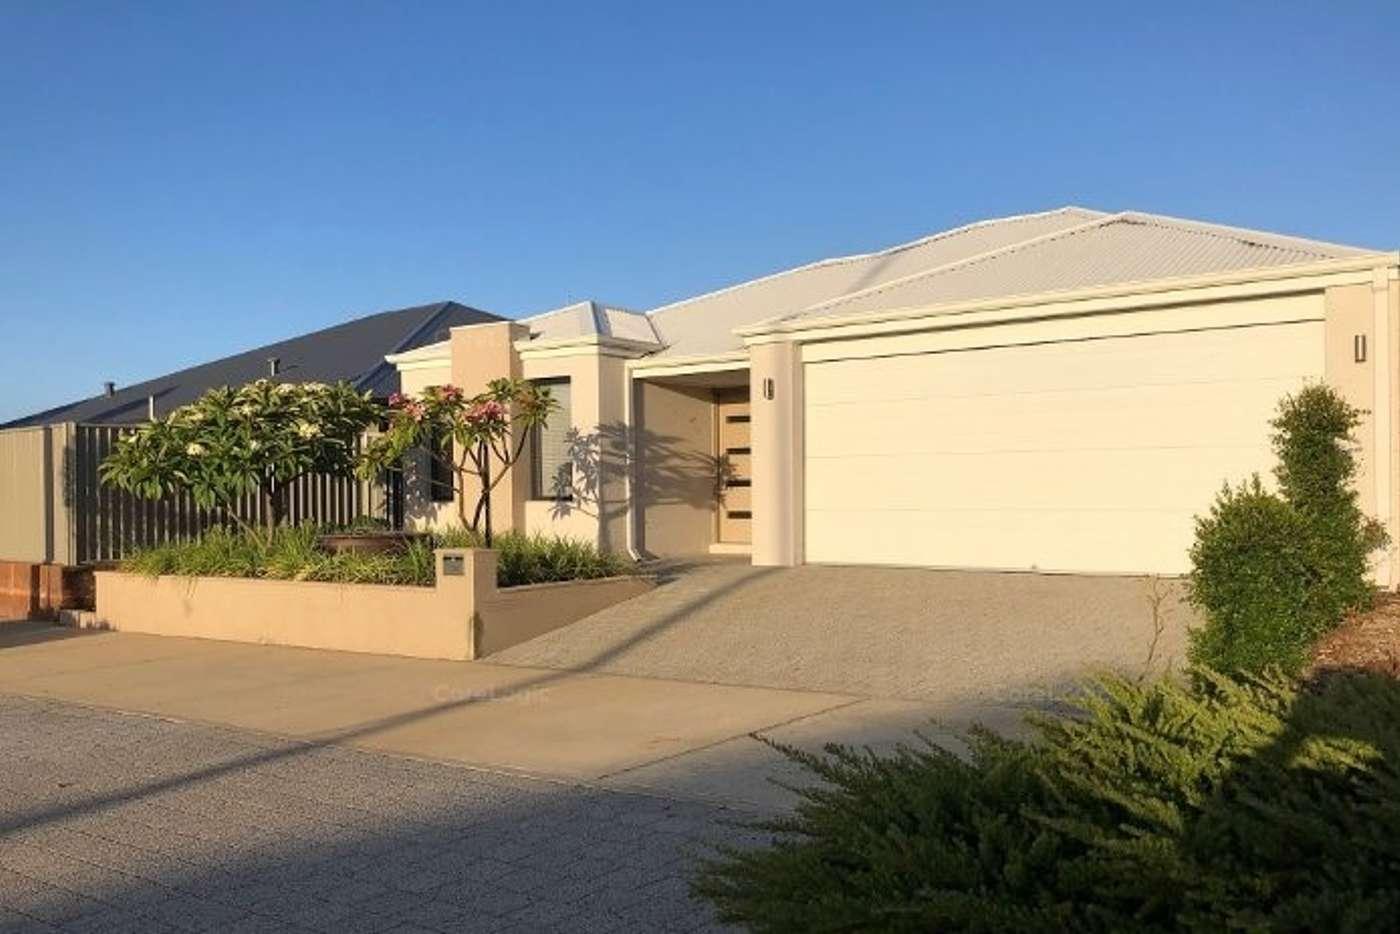 Main view of Homely house listing, 136 Honeywood Avenue, Wandi WA 6167